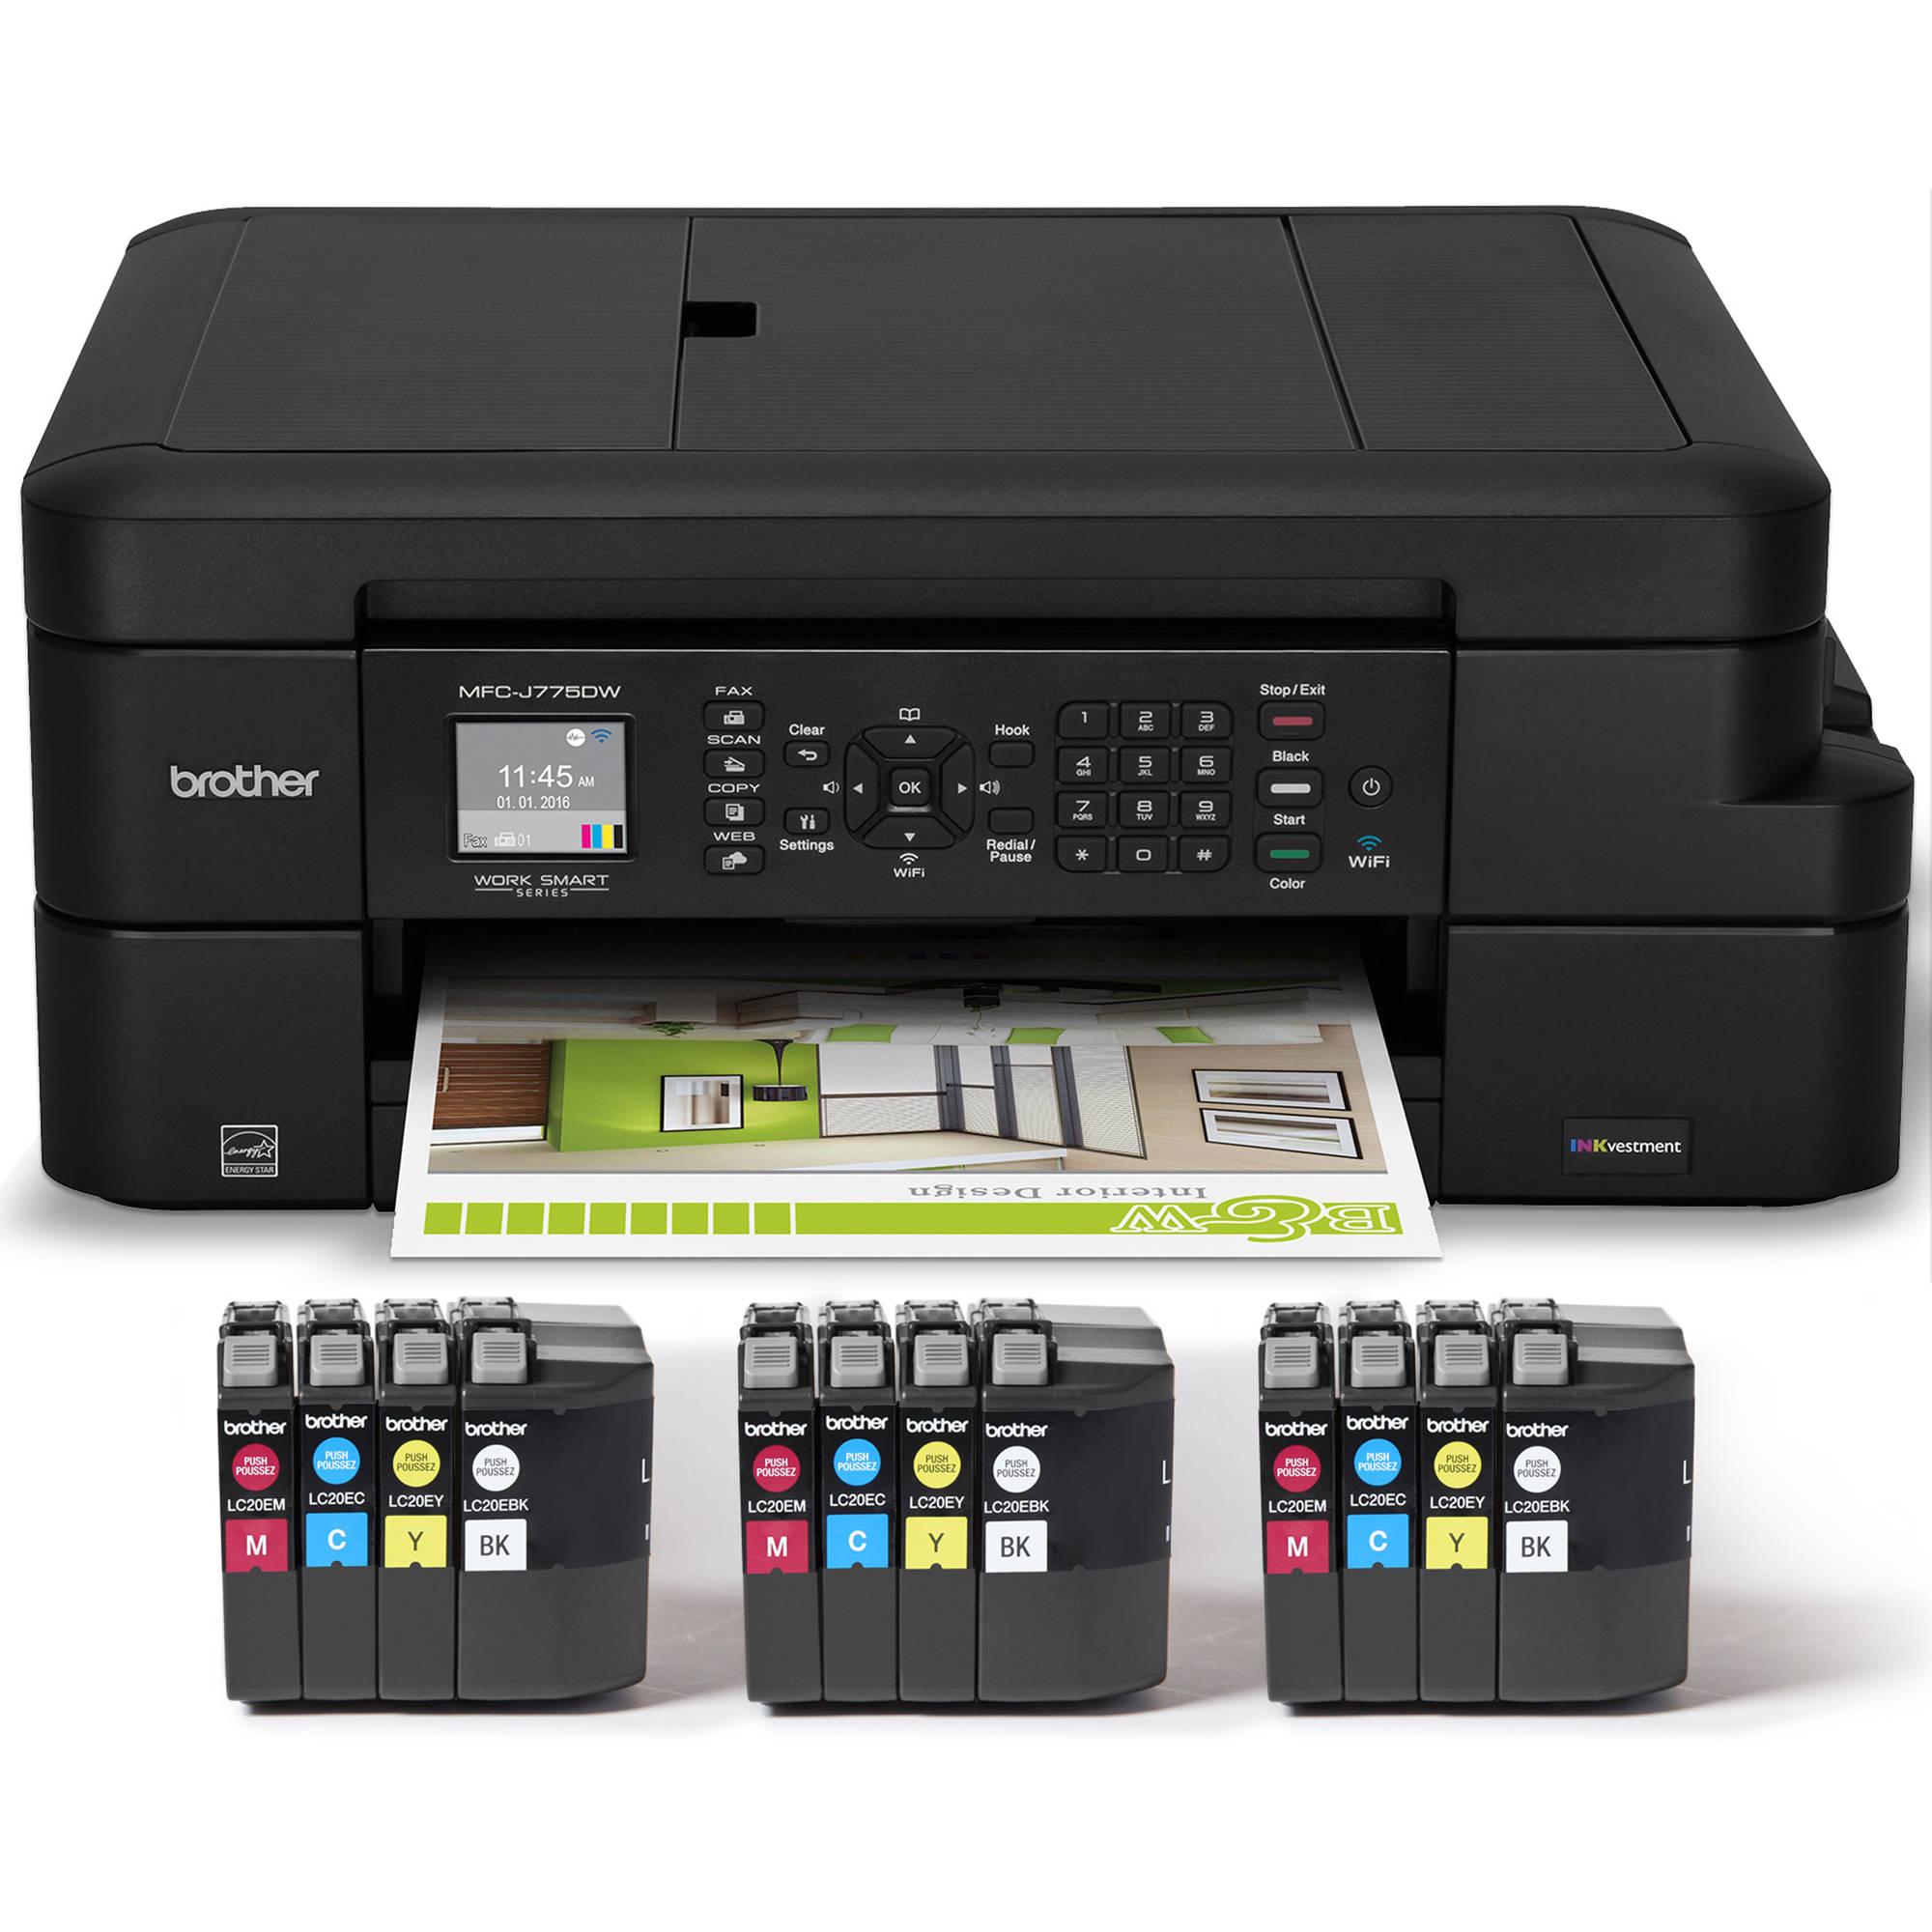 Https C Product 1388976 Reg Lenovo Ideacenter 300 0aid 20ish Core I7 6700 Geforce Gt720 2gb 4gbddr4 1 Year Warranty Brother Mfc J775dw Xl Aio Printer 1389421